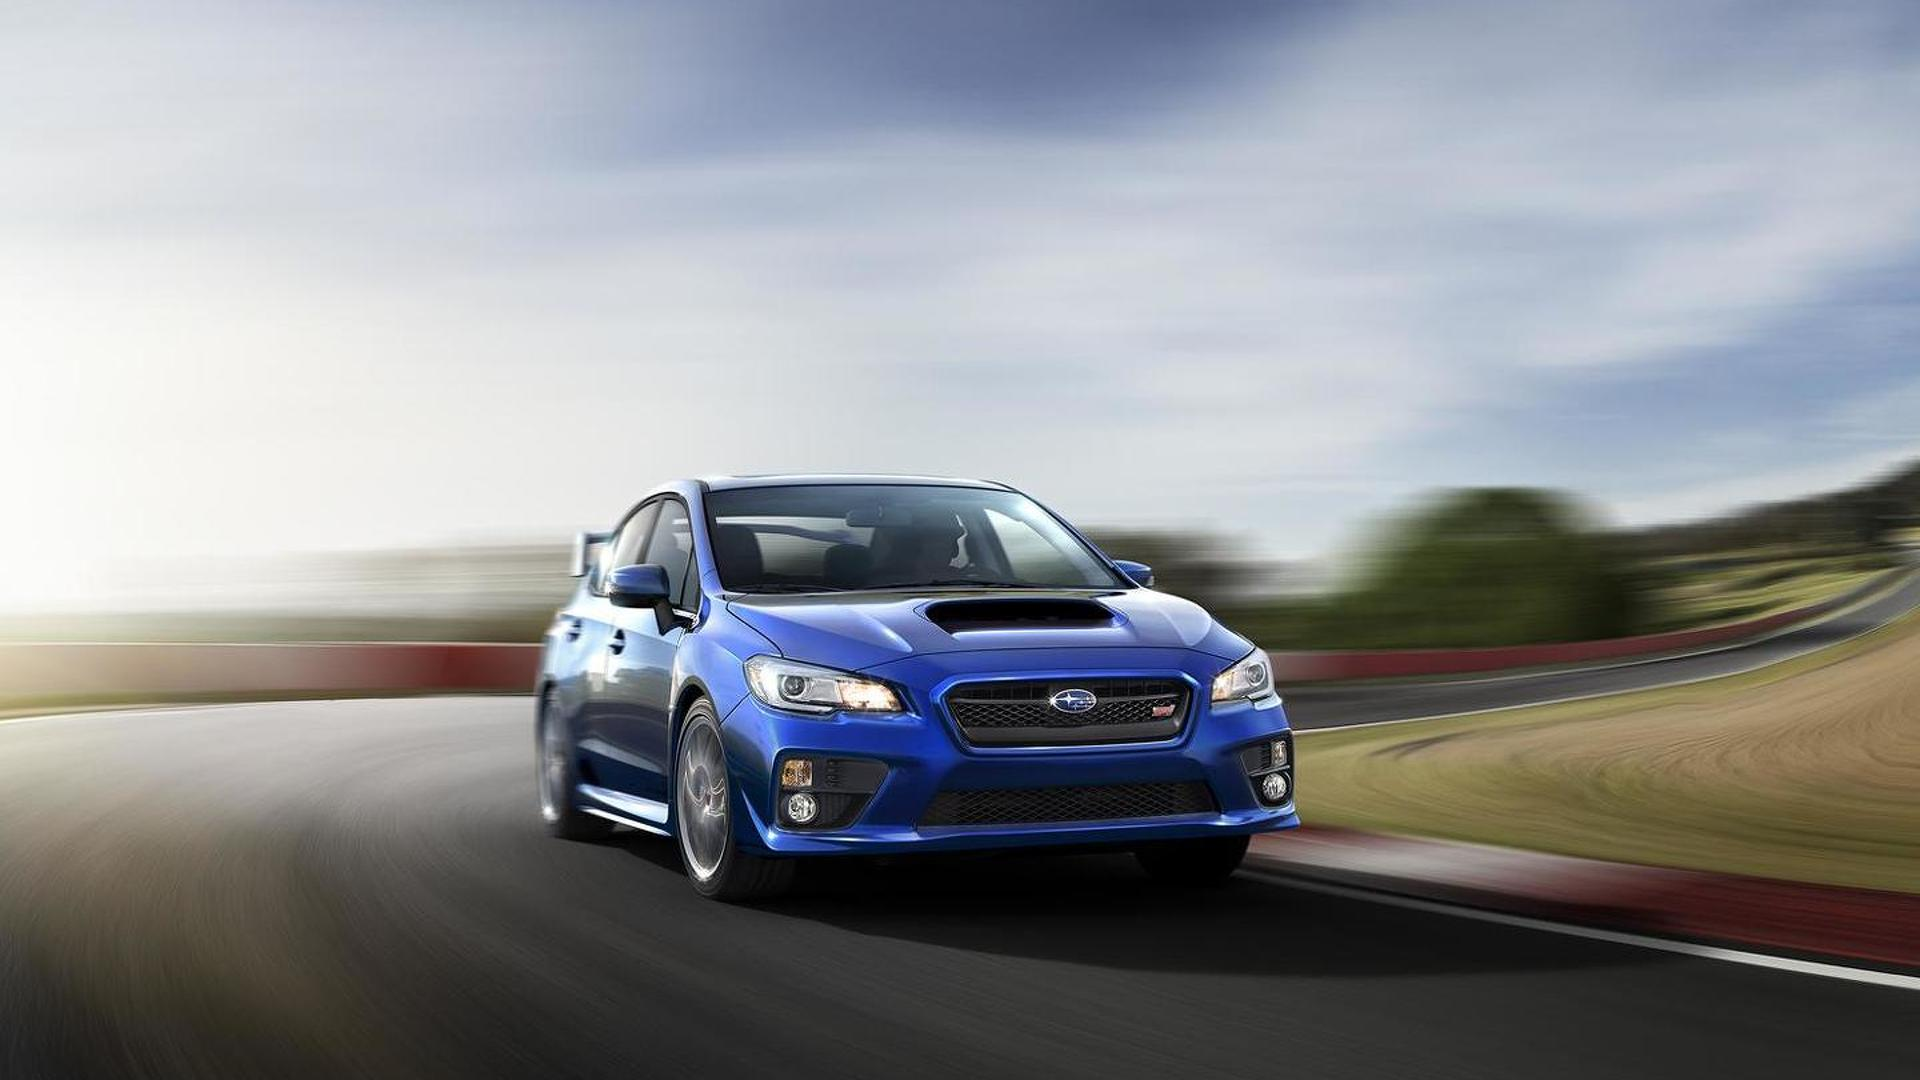 2017 Subaru Wrx Wrx Sti Priced From 26 695